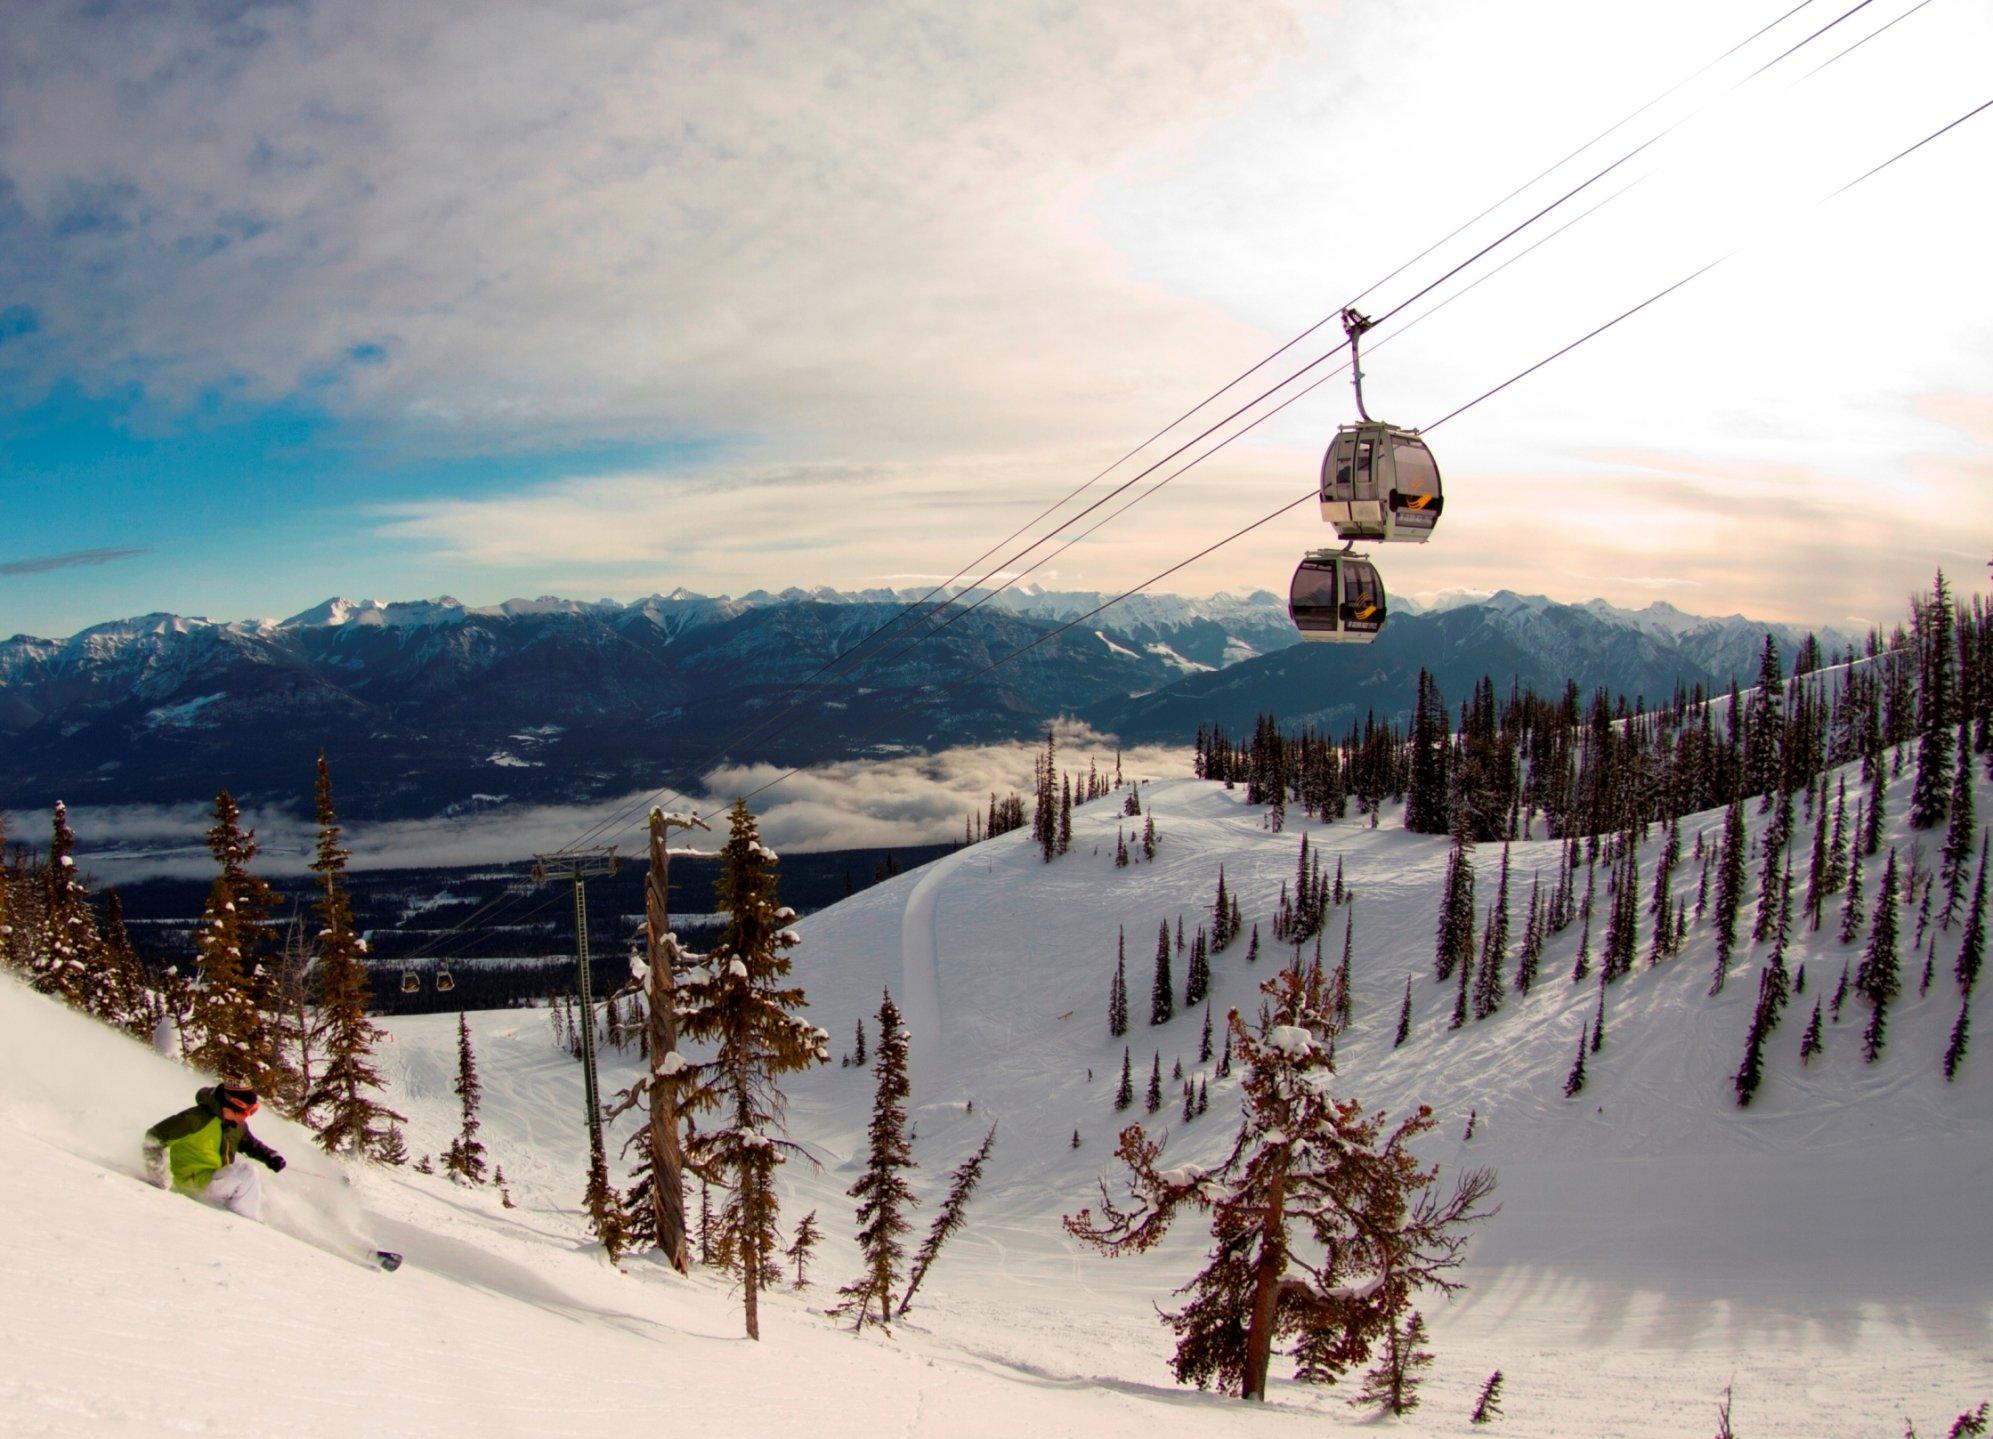 bestemming kicking horse canada gondola en skiën grip.jpg